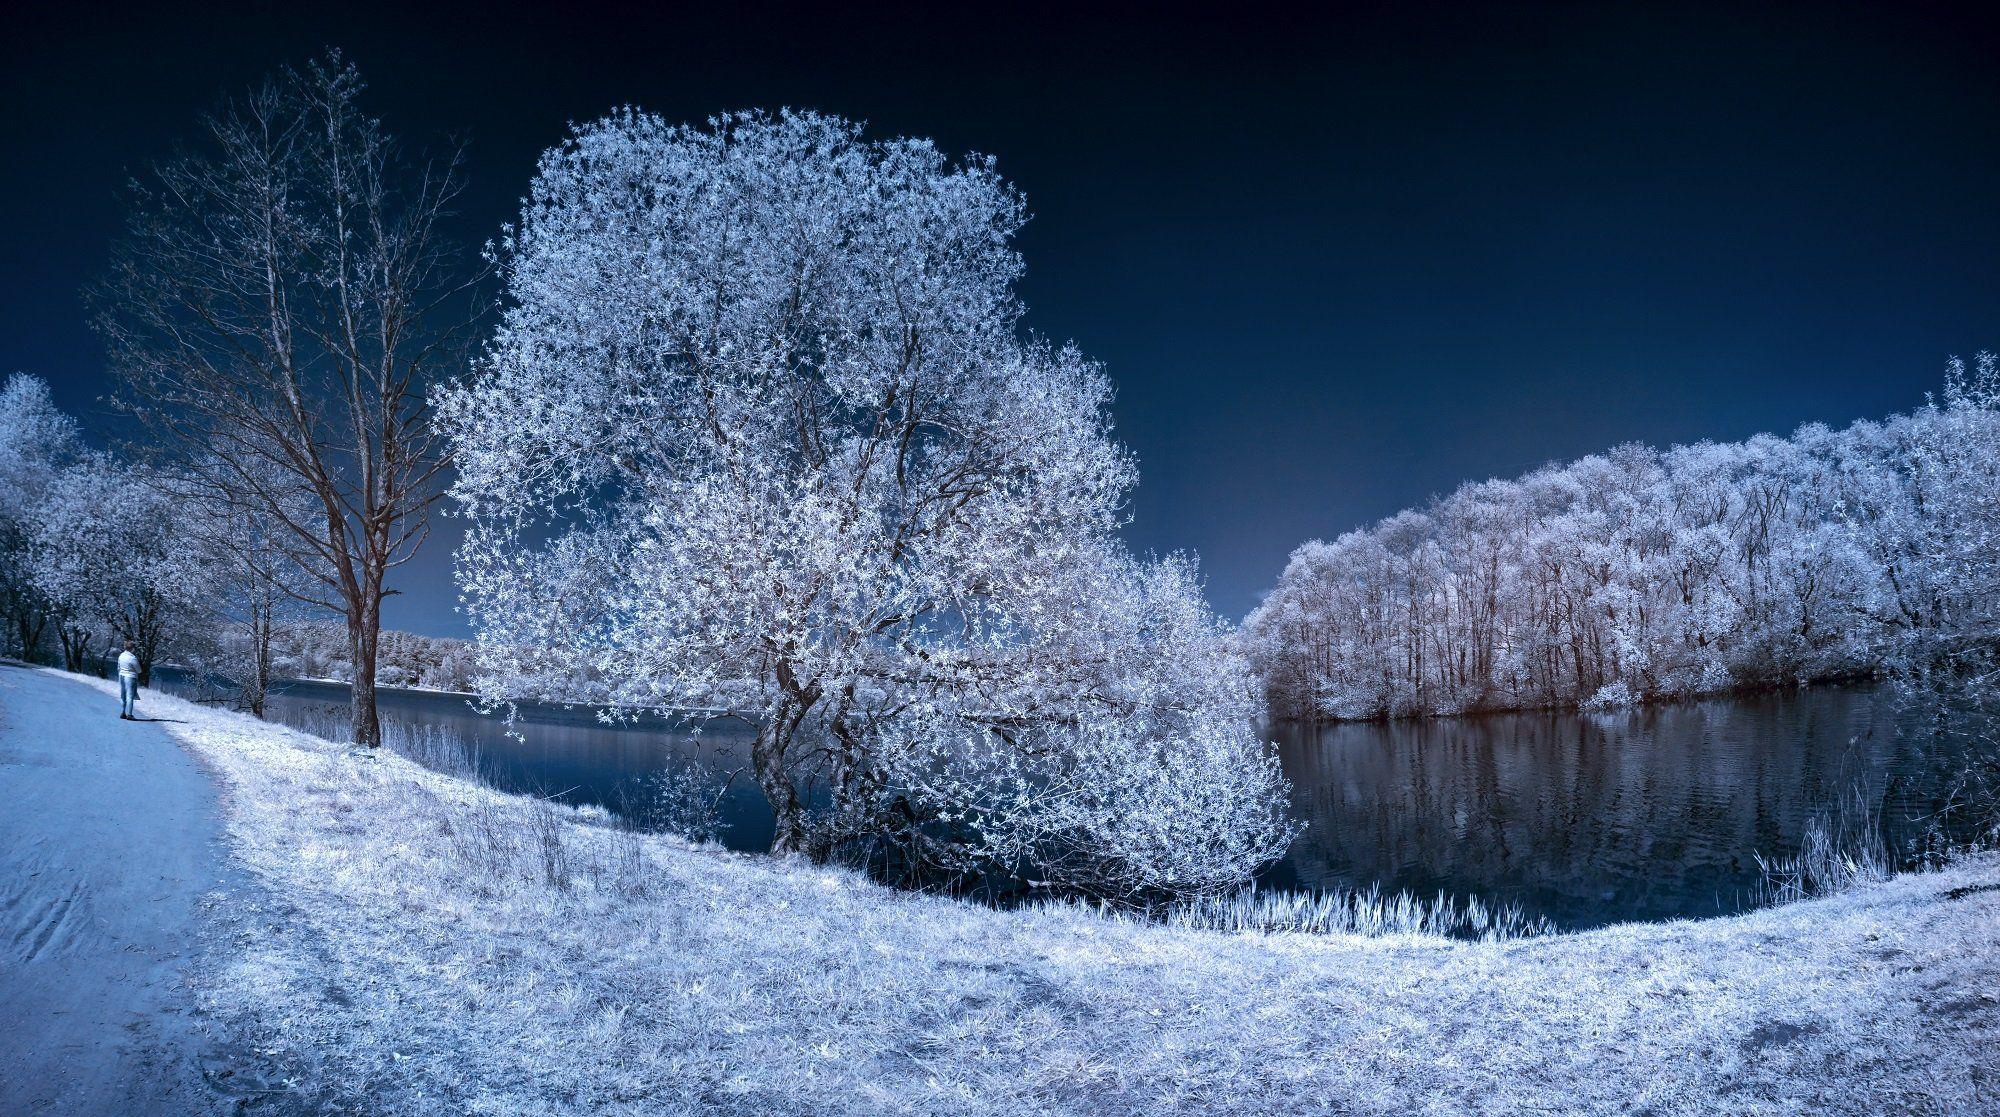 infrared,ик-фото,инфракрасное фото,инфракрасная фотография,пейзаж,природа,беларусь,весна, Sixten ( Сергей )